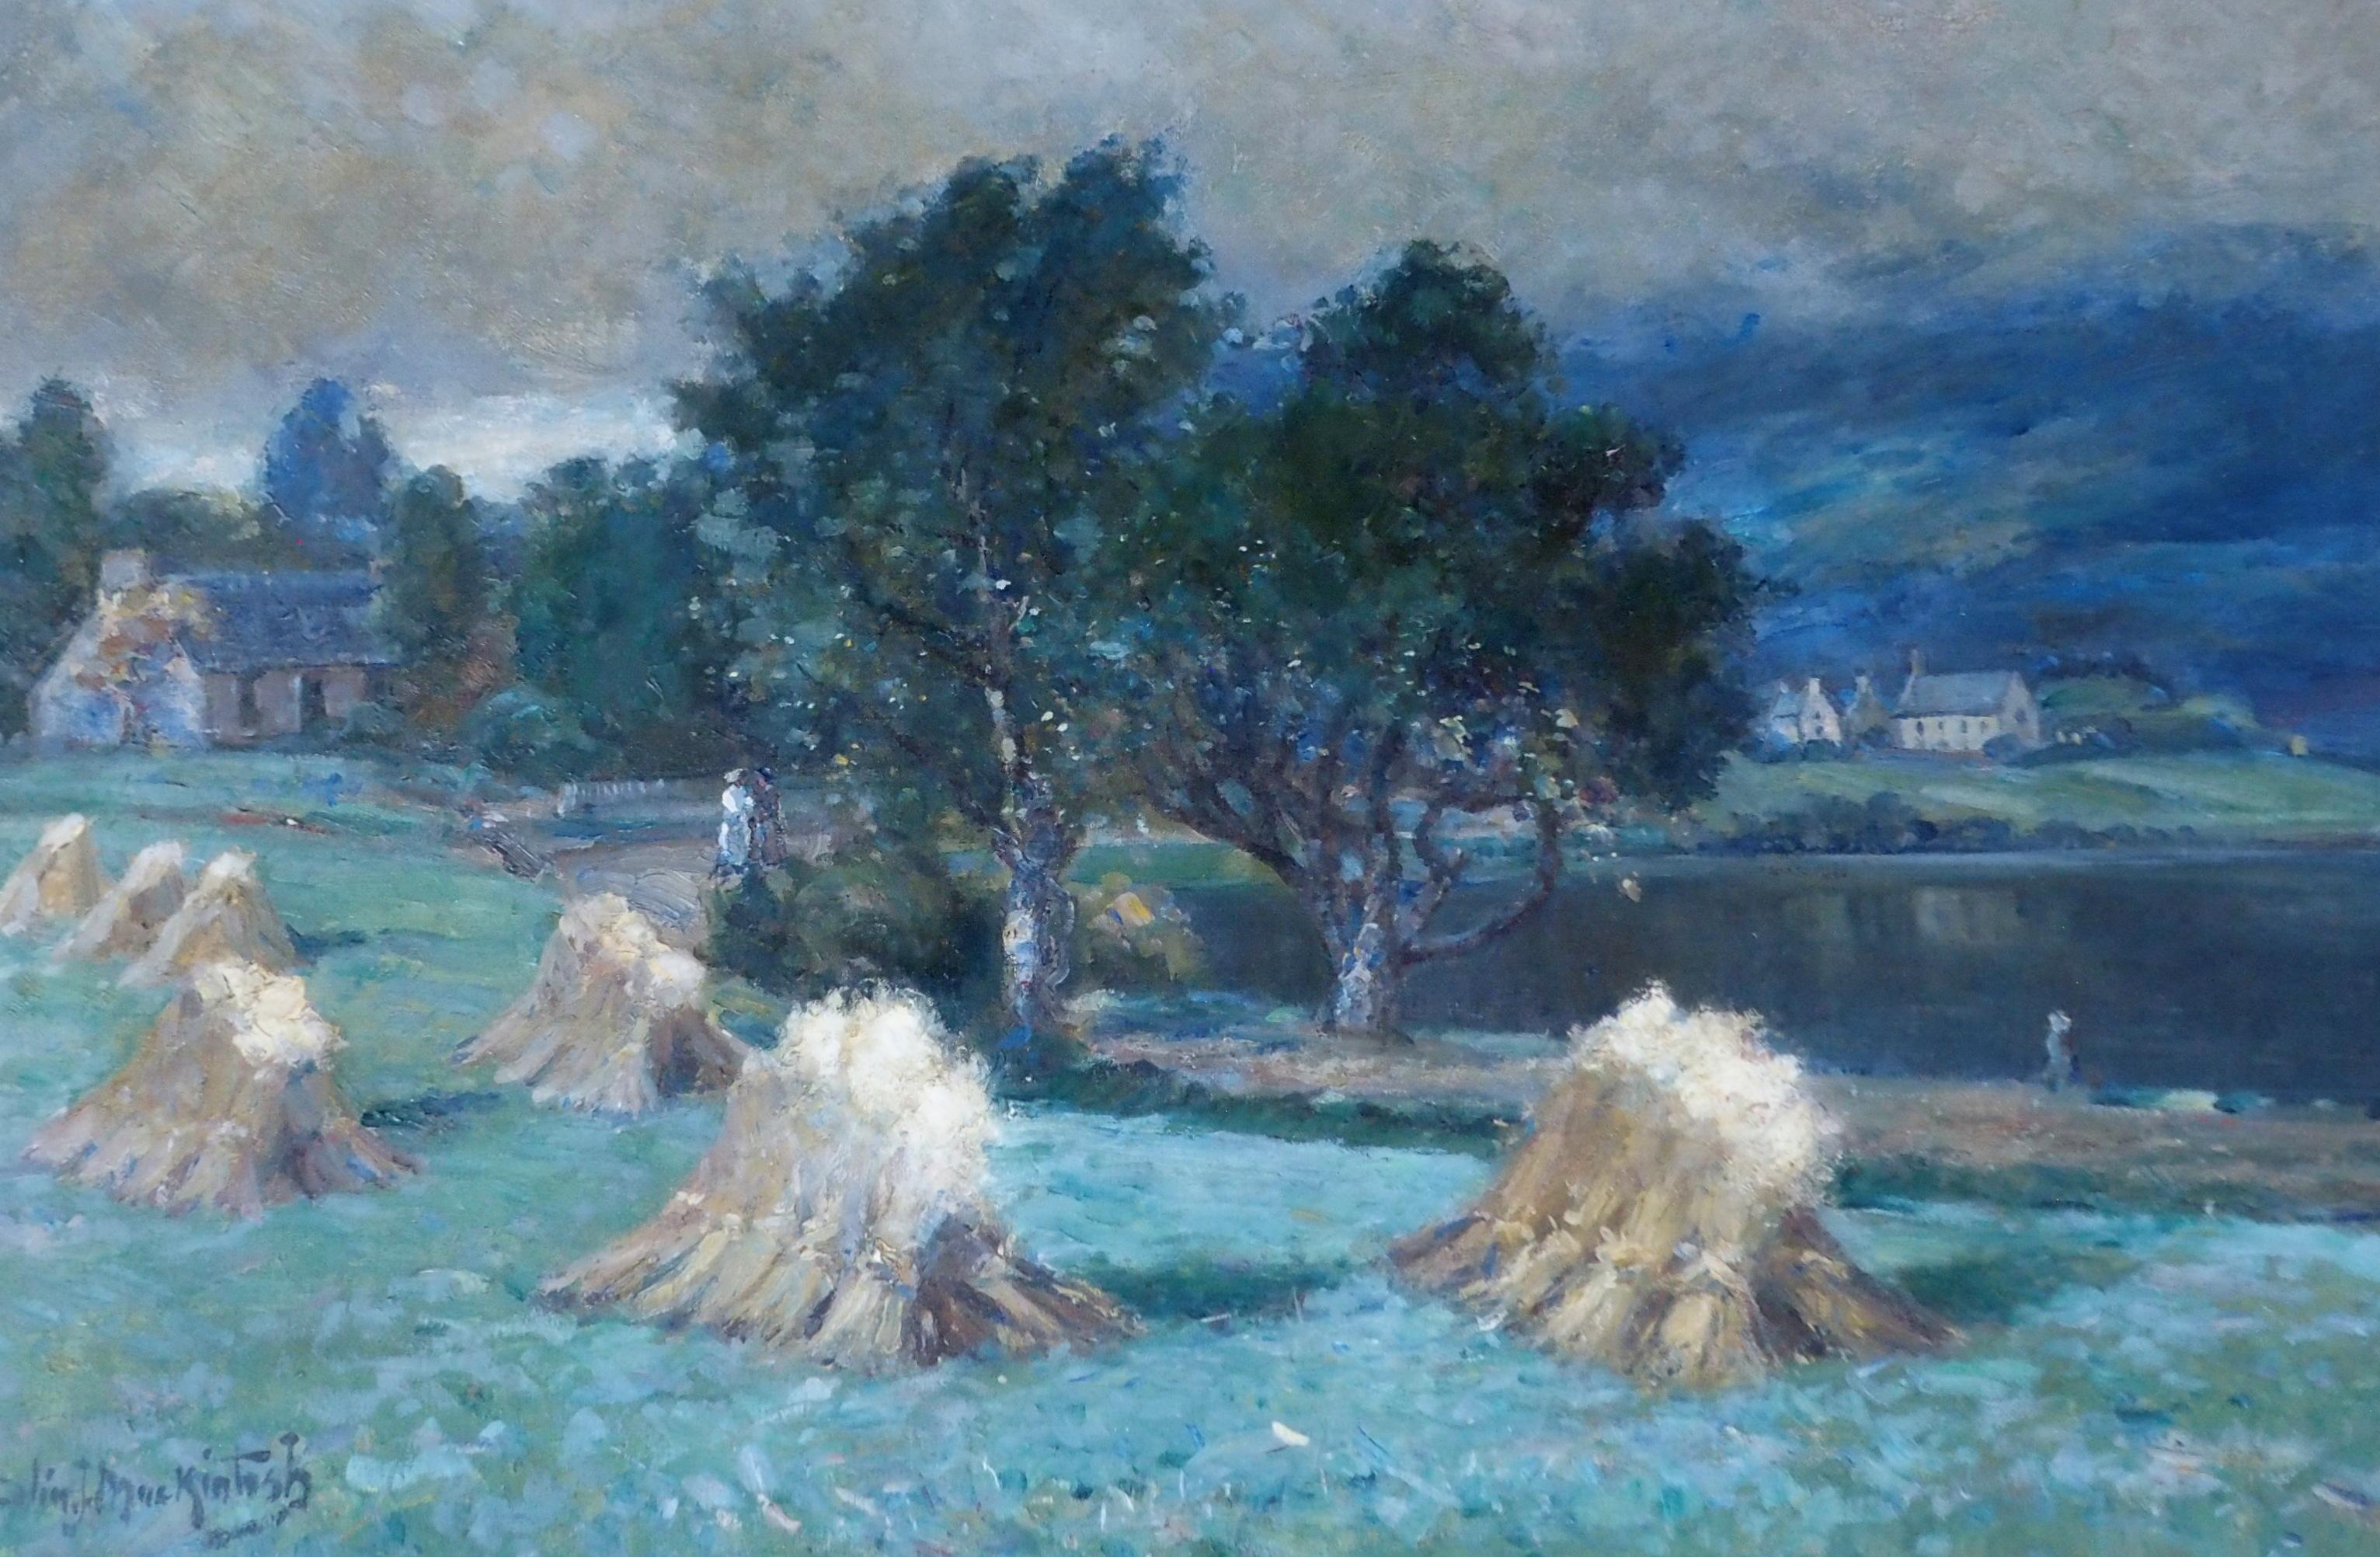 COLIN JOHN MACKINTOSH (SCOTTISH 1866-1910) CORN STOOKS, LOCH ALVIE Oil on canvas, signed, 61 x 91. - Image 4 of 6